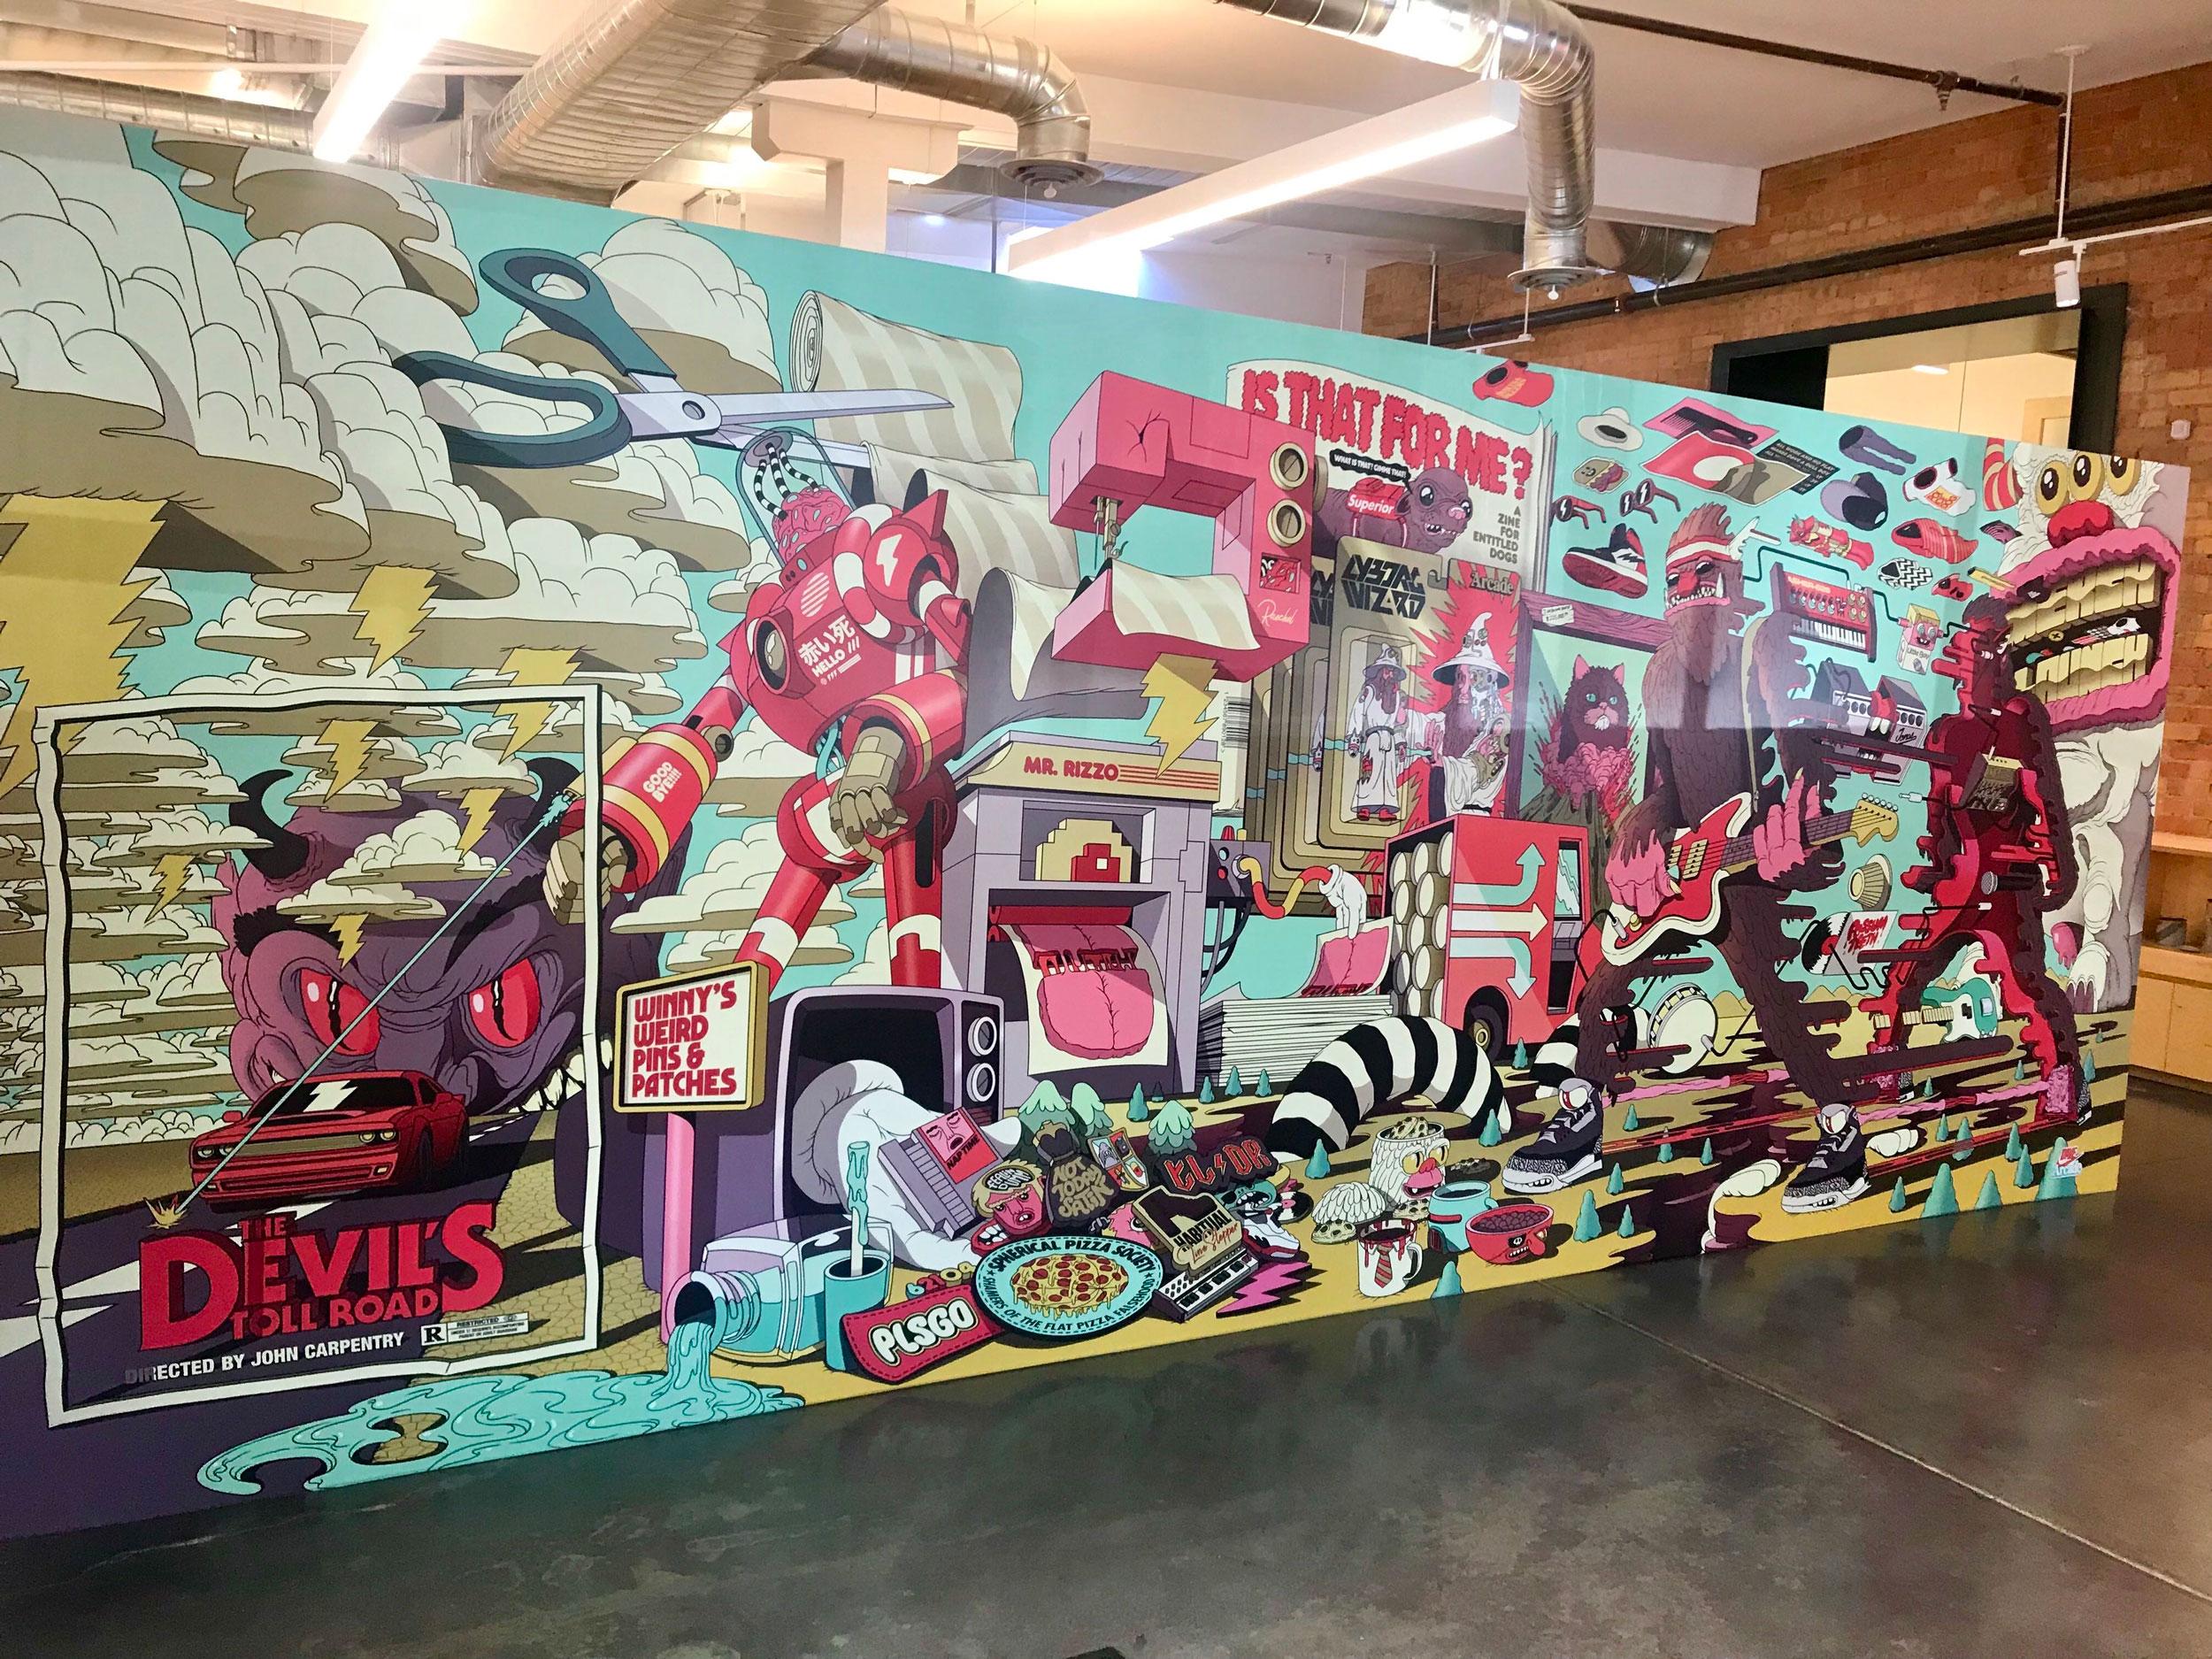 Big_Cartel-Mural-Dave-_Arcade-Live-Web.jpg